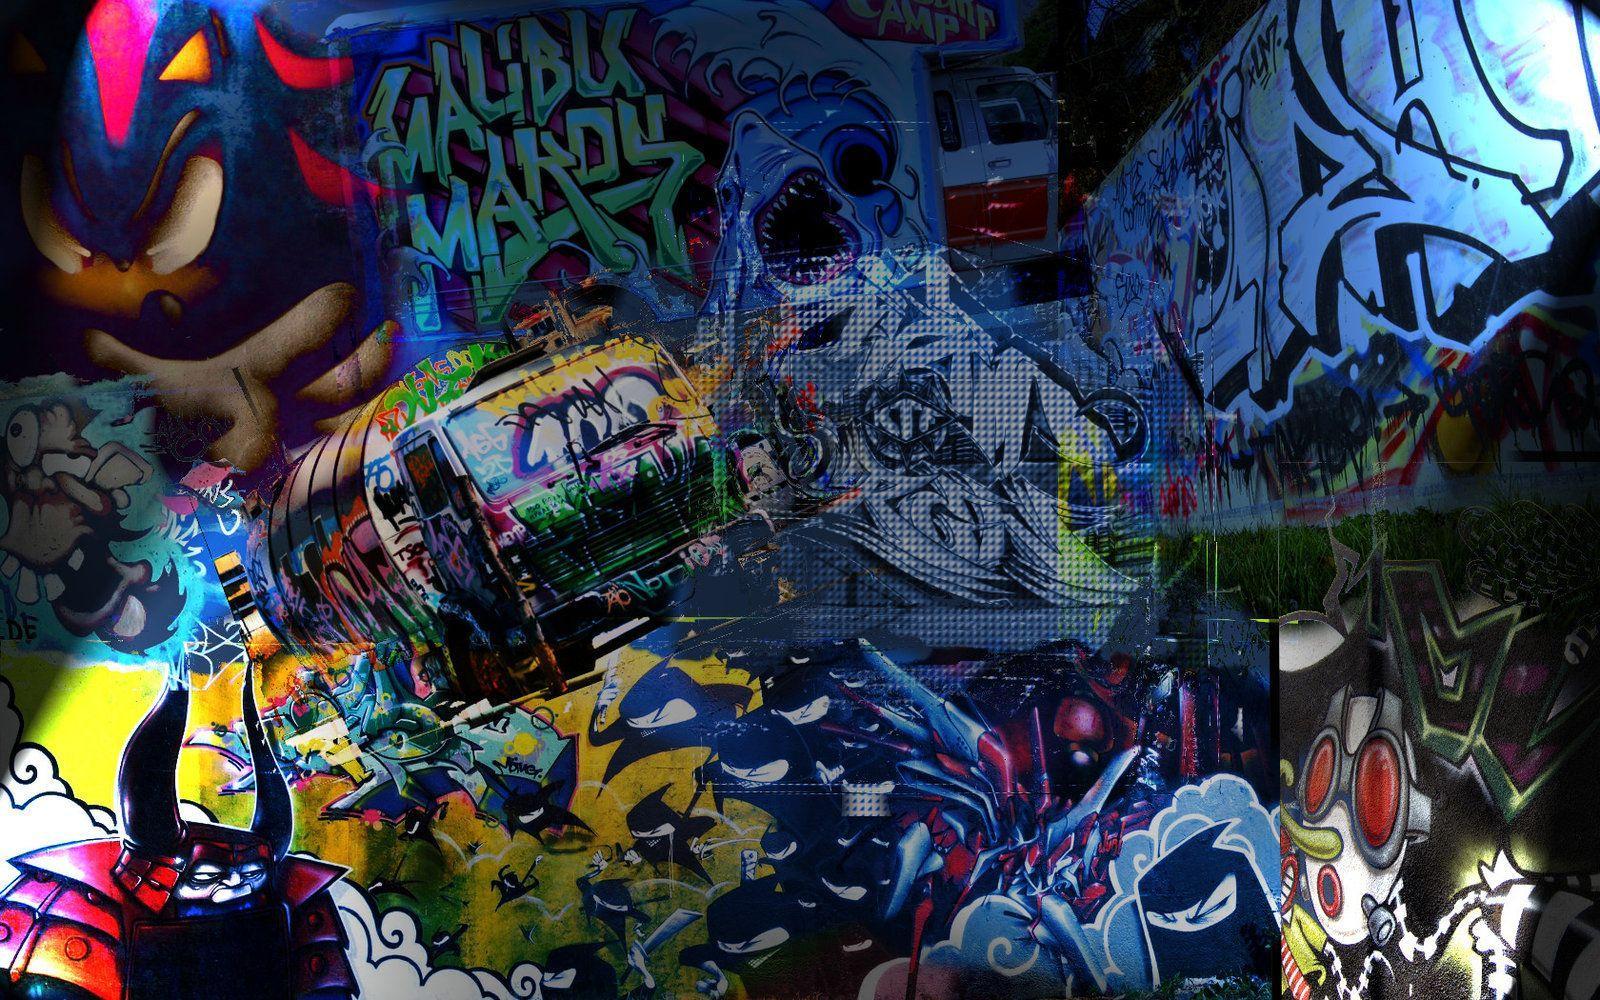 Restaurant Wallpaper Graffiti Photo Wall Mural D Brick Backsplash